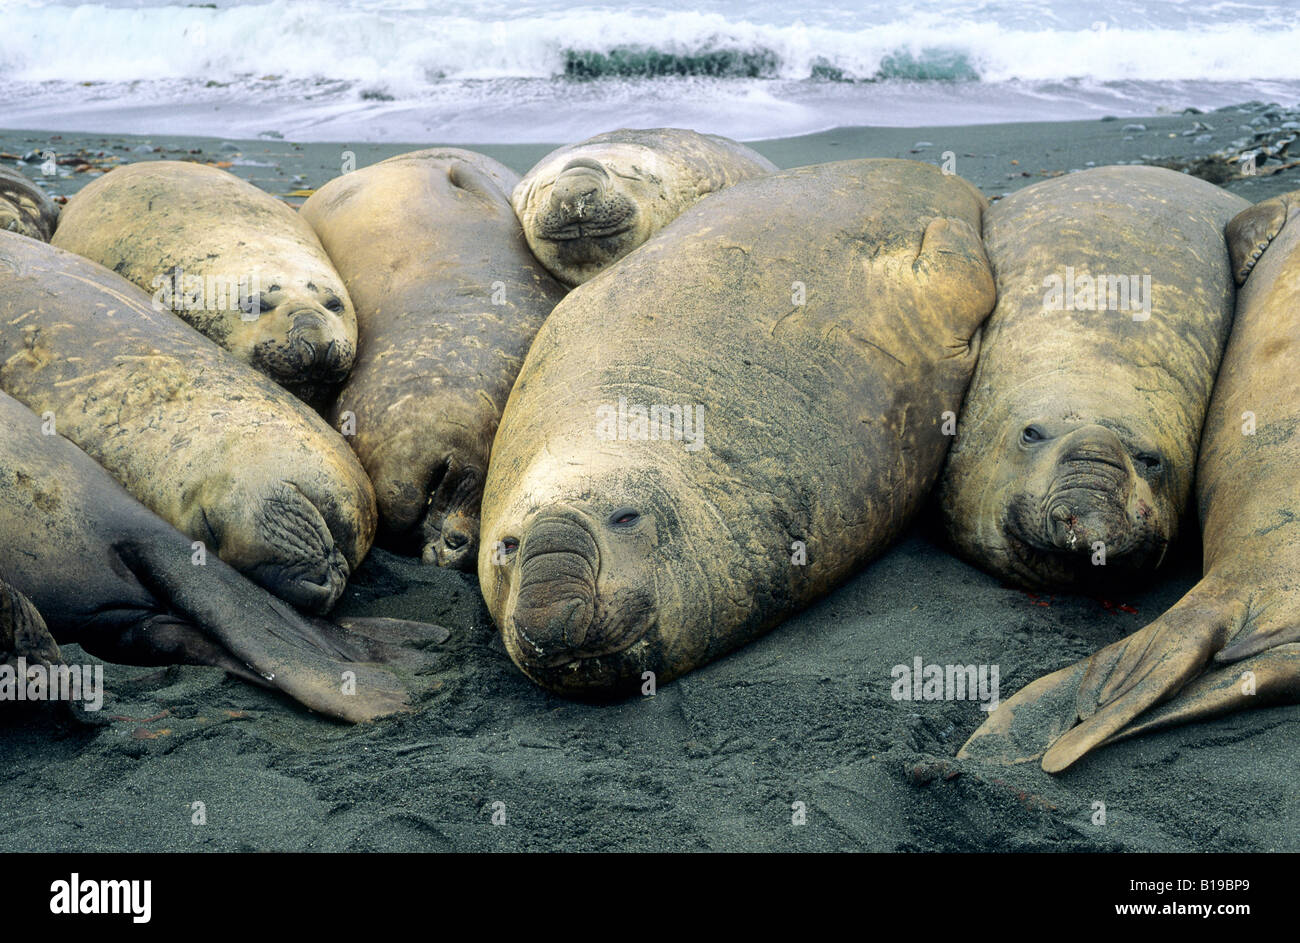 Southern elephant seal (Mirouanga leonina) bulls basking on the beach, Macquarie Island, Sub-Antarctic Australia - Stock Image